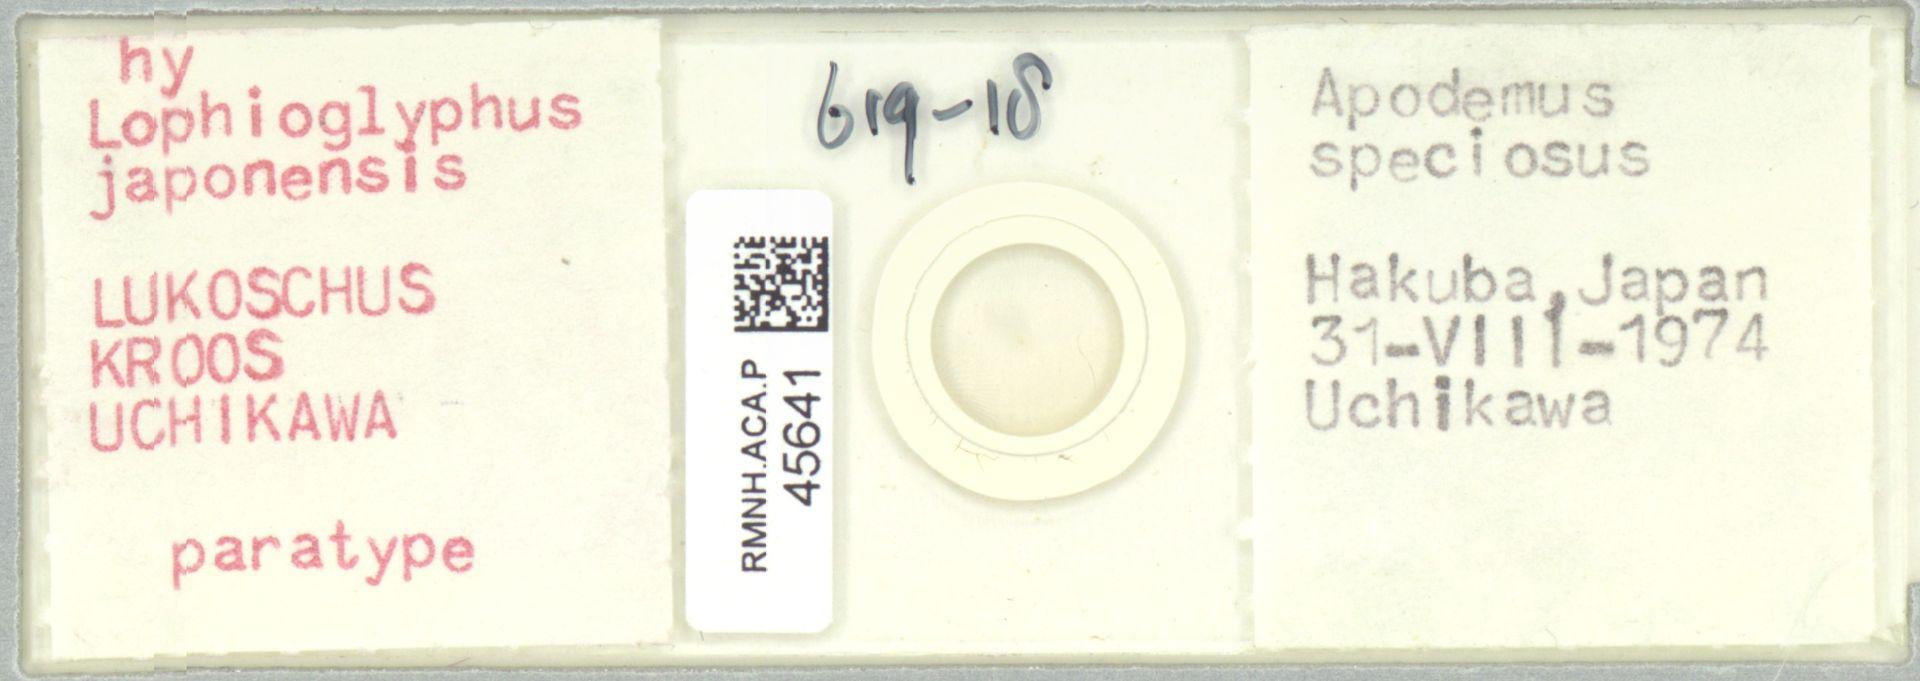 RMNH.ACA.P.45641 | Lophioglyphus japonensis Lukoschus, Kroos, Uchikawa